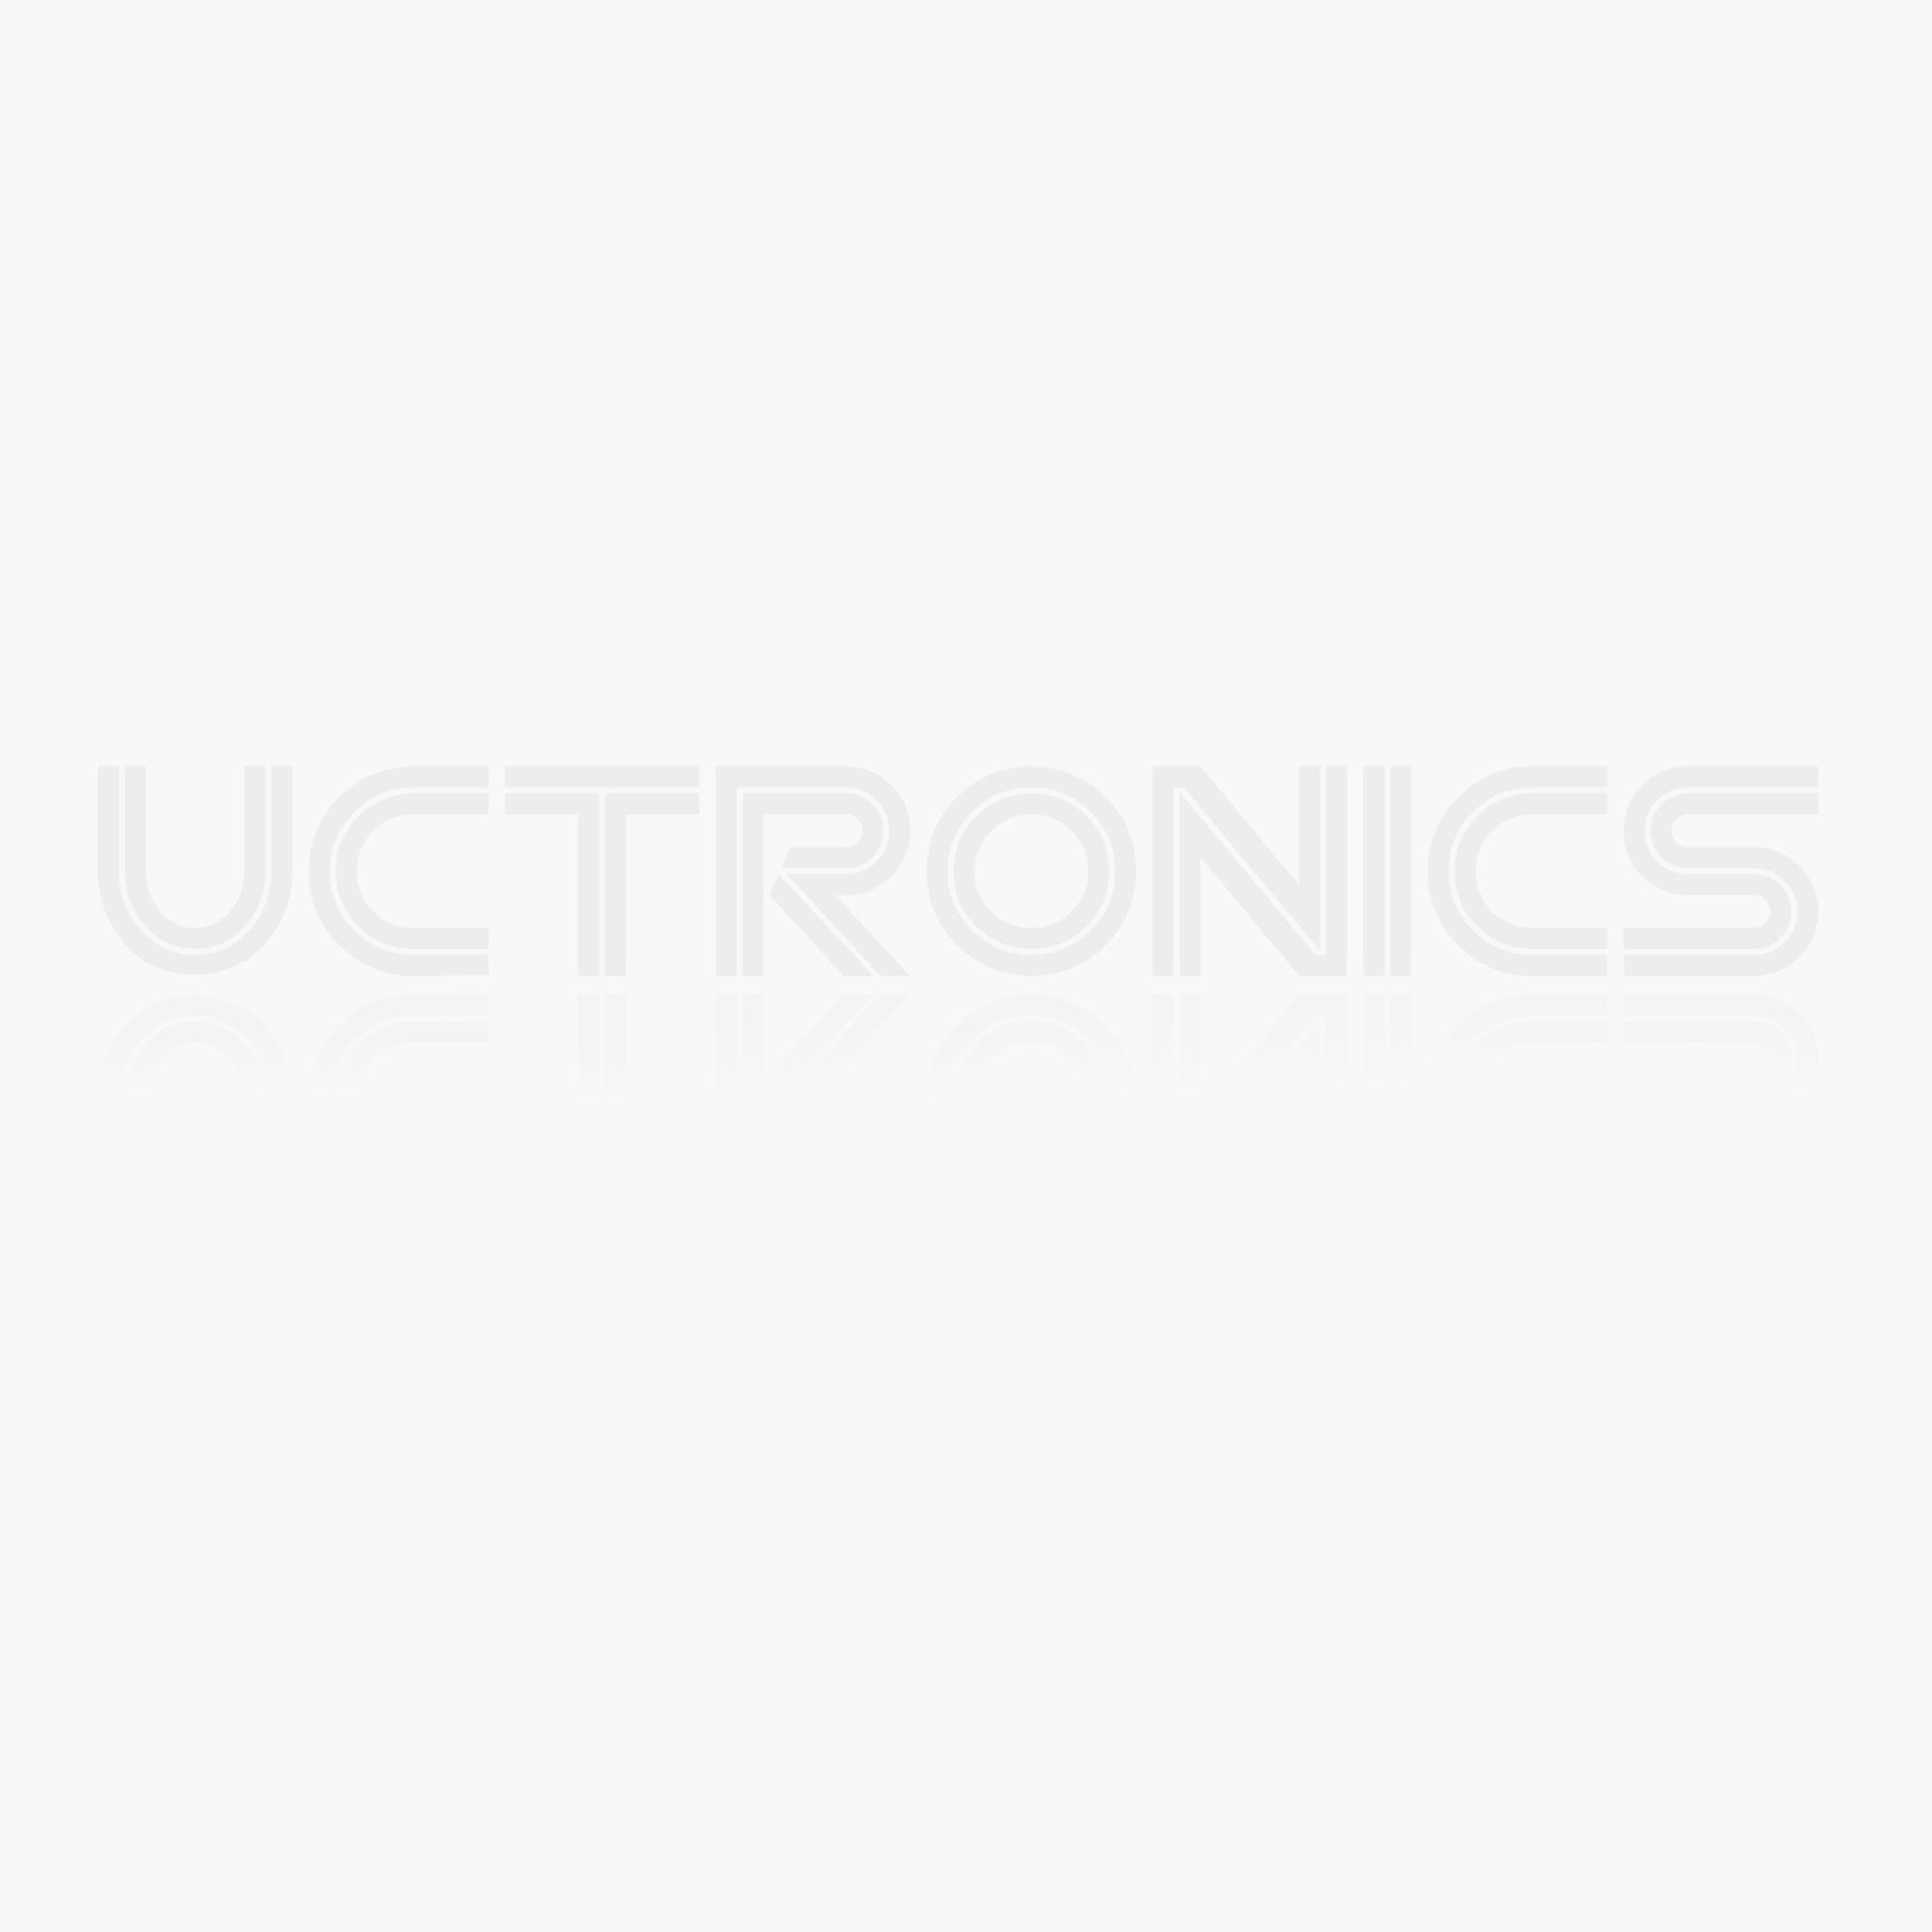 CC3200 UART TTL Wifi Wireless Module MCU ARM for CC3200-LAUNCHXL for Arduino